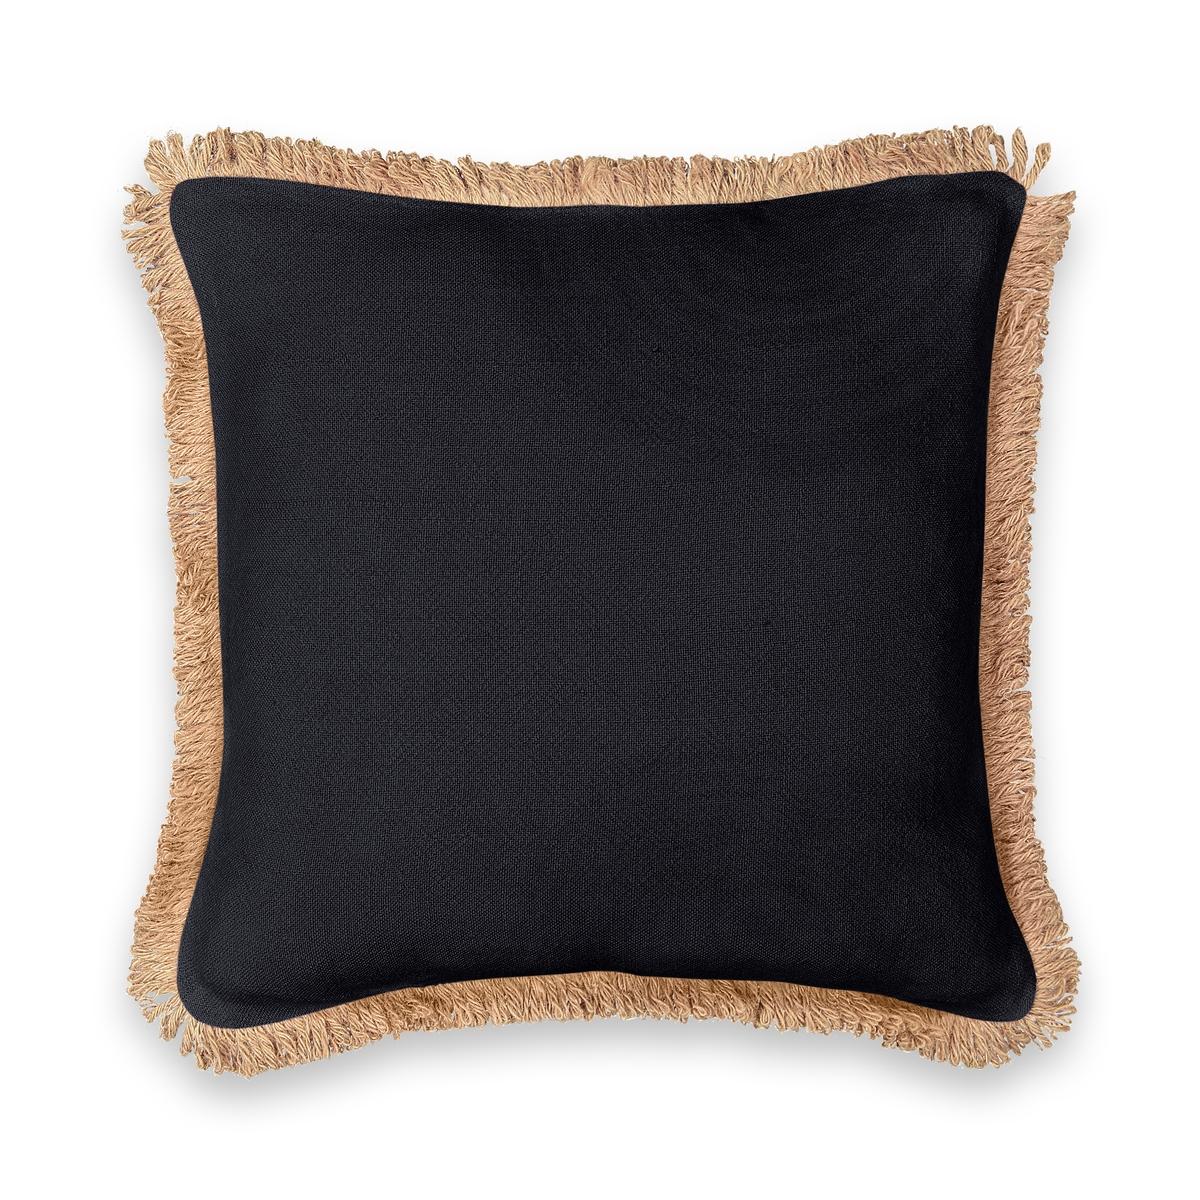 Чехол La Redoute На подушку из джута Jutty 50 x 50 см черный